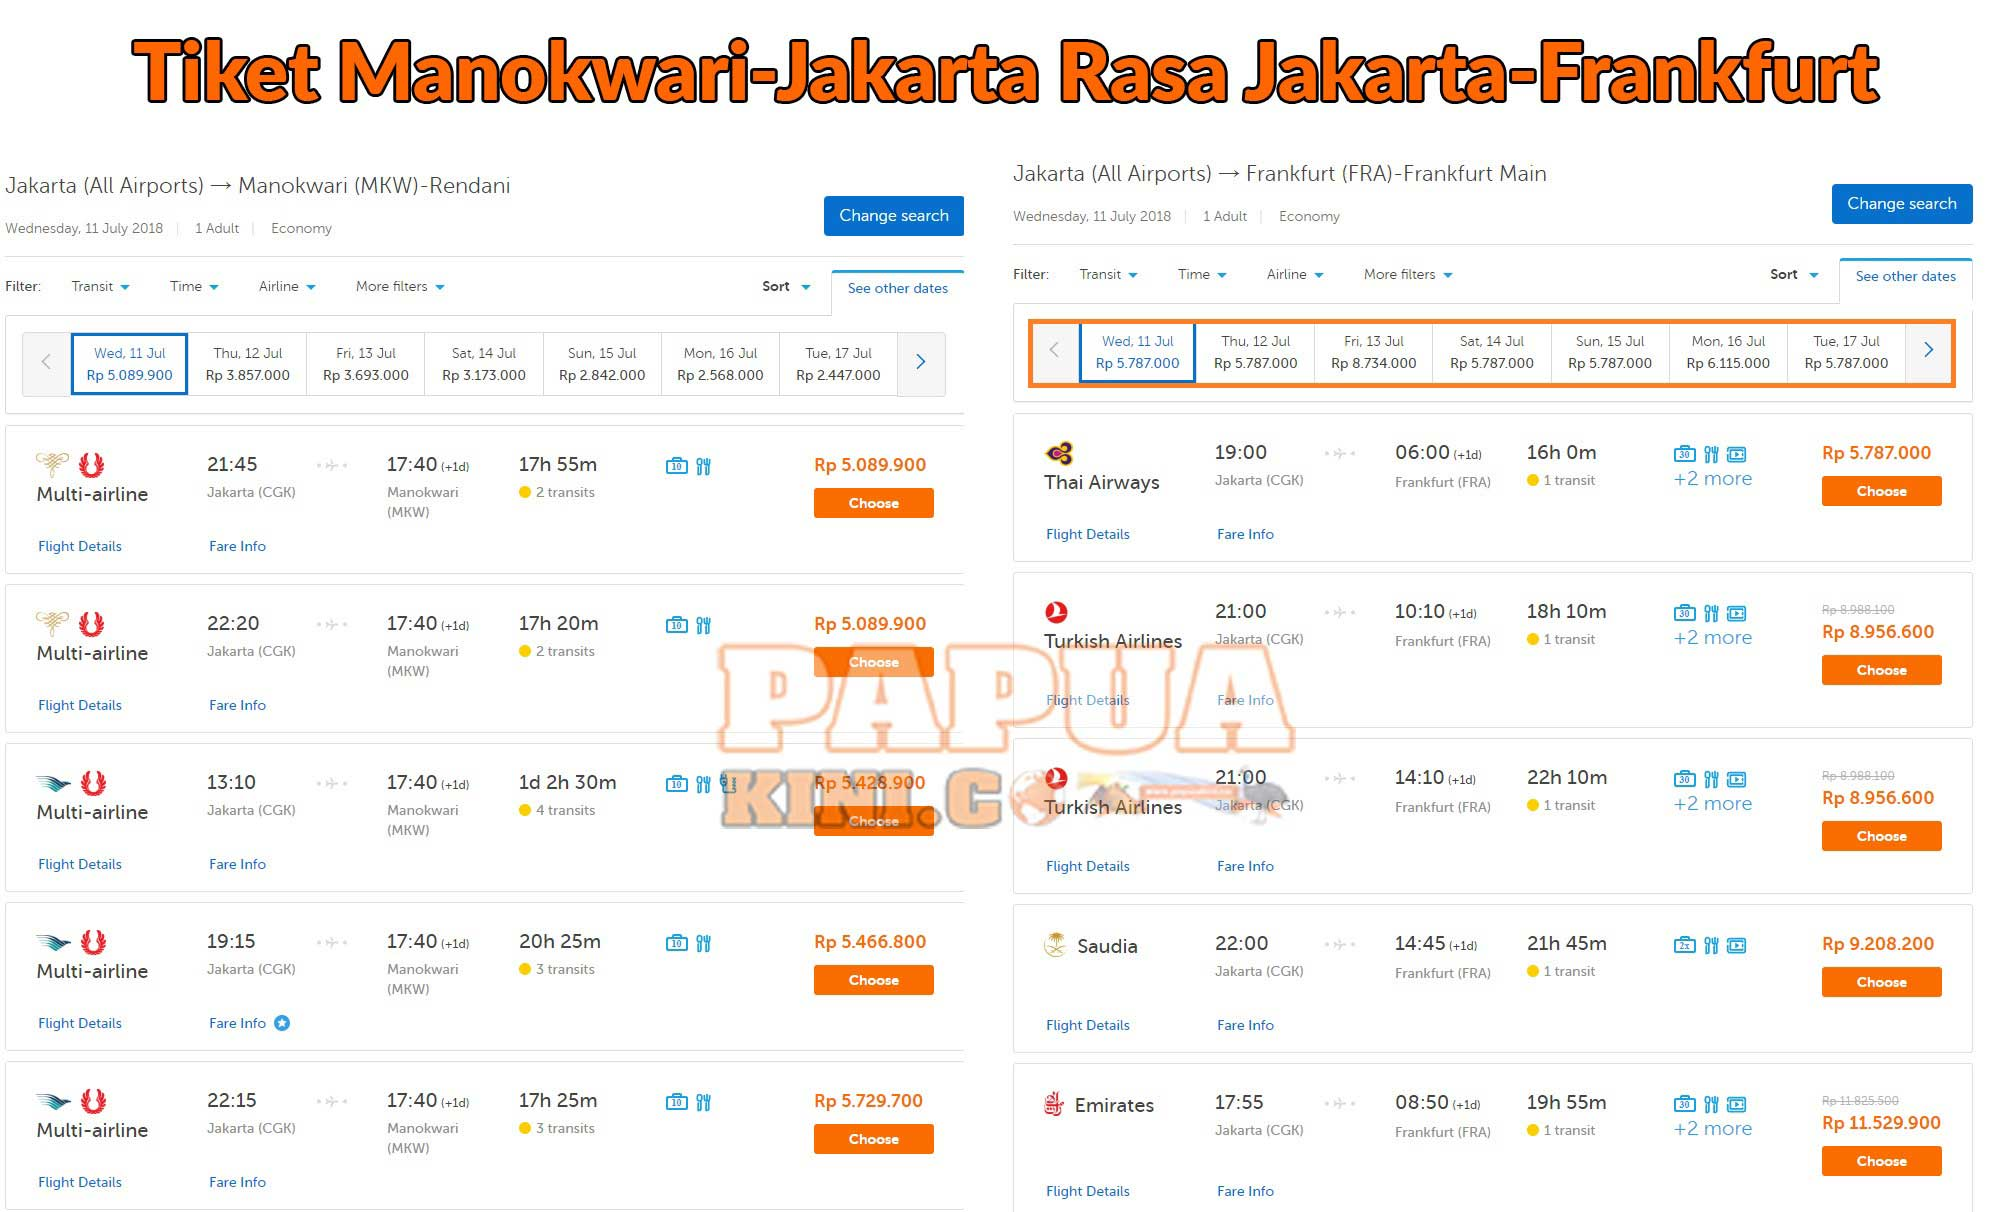 Pesparamanas XV Mendekat, Tiket Jakarta-Manokwari Rasa ke Frankfurt